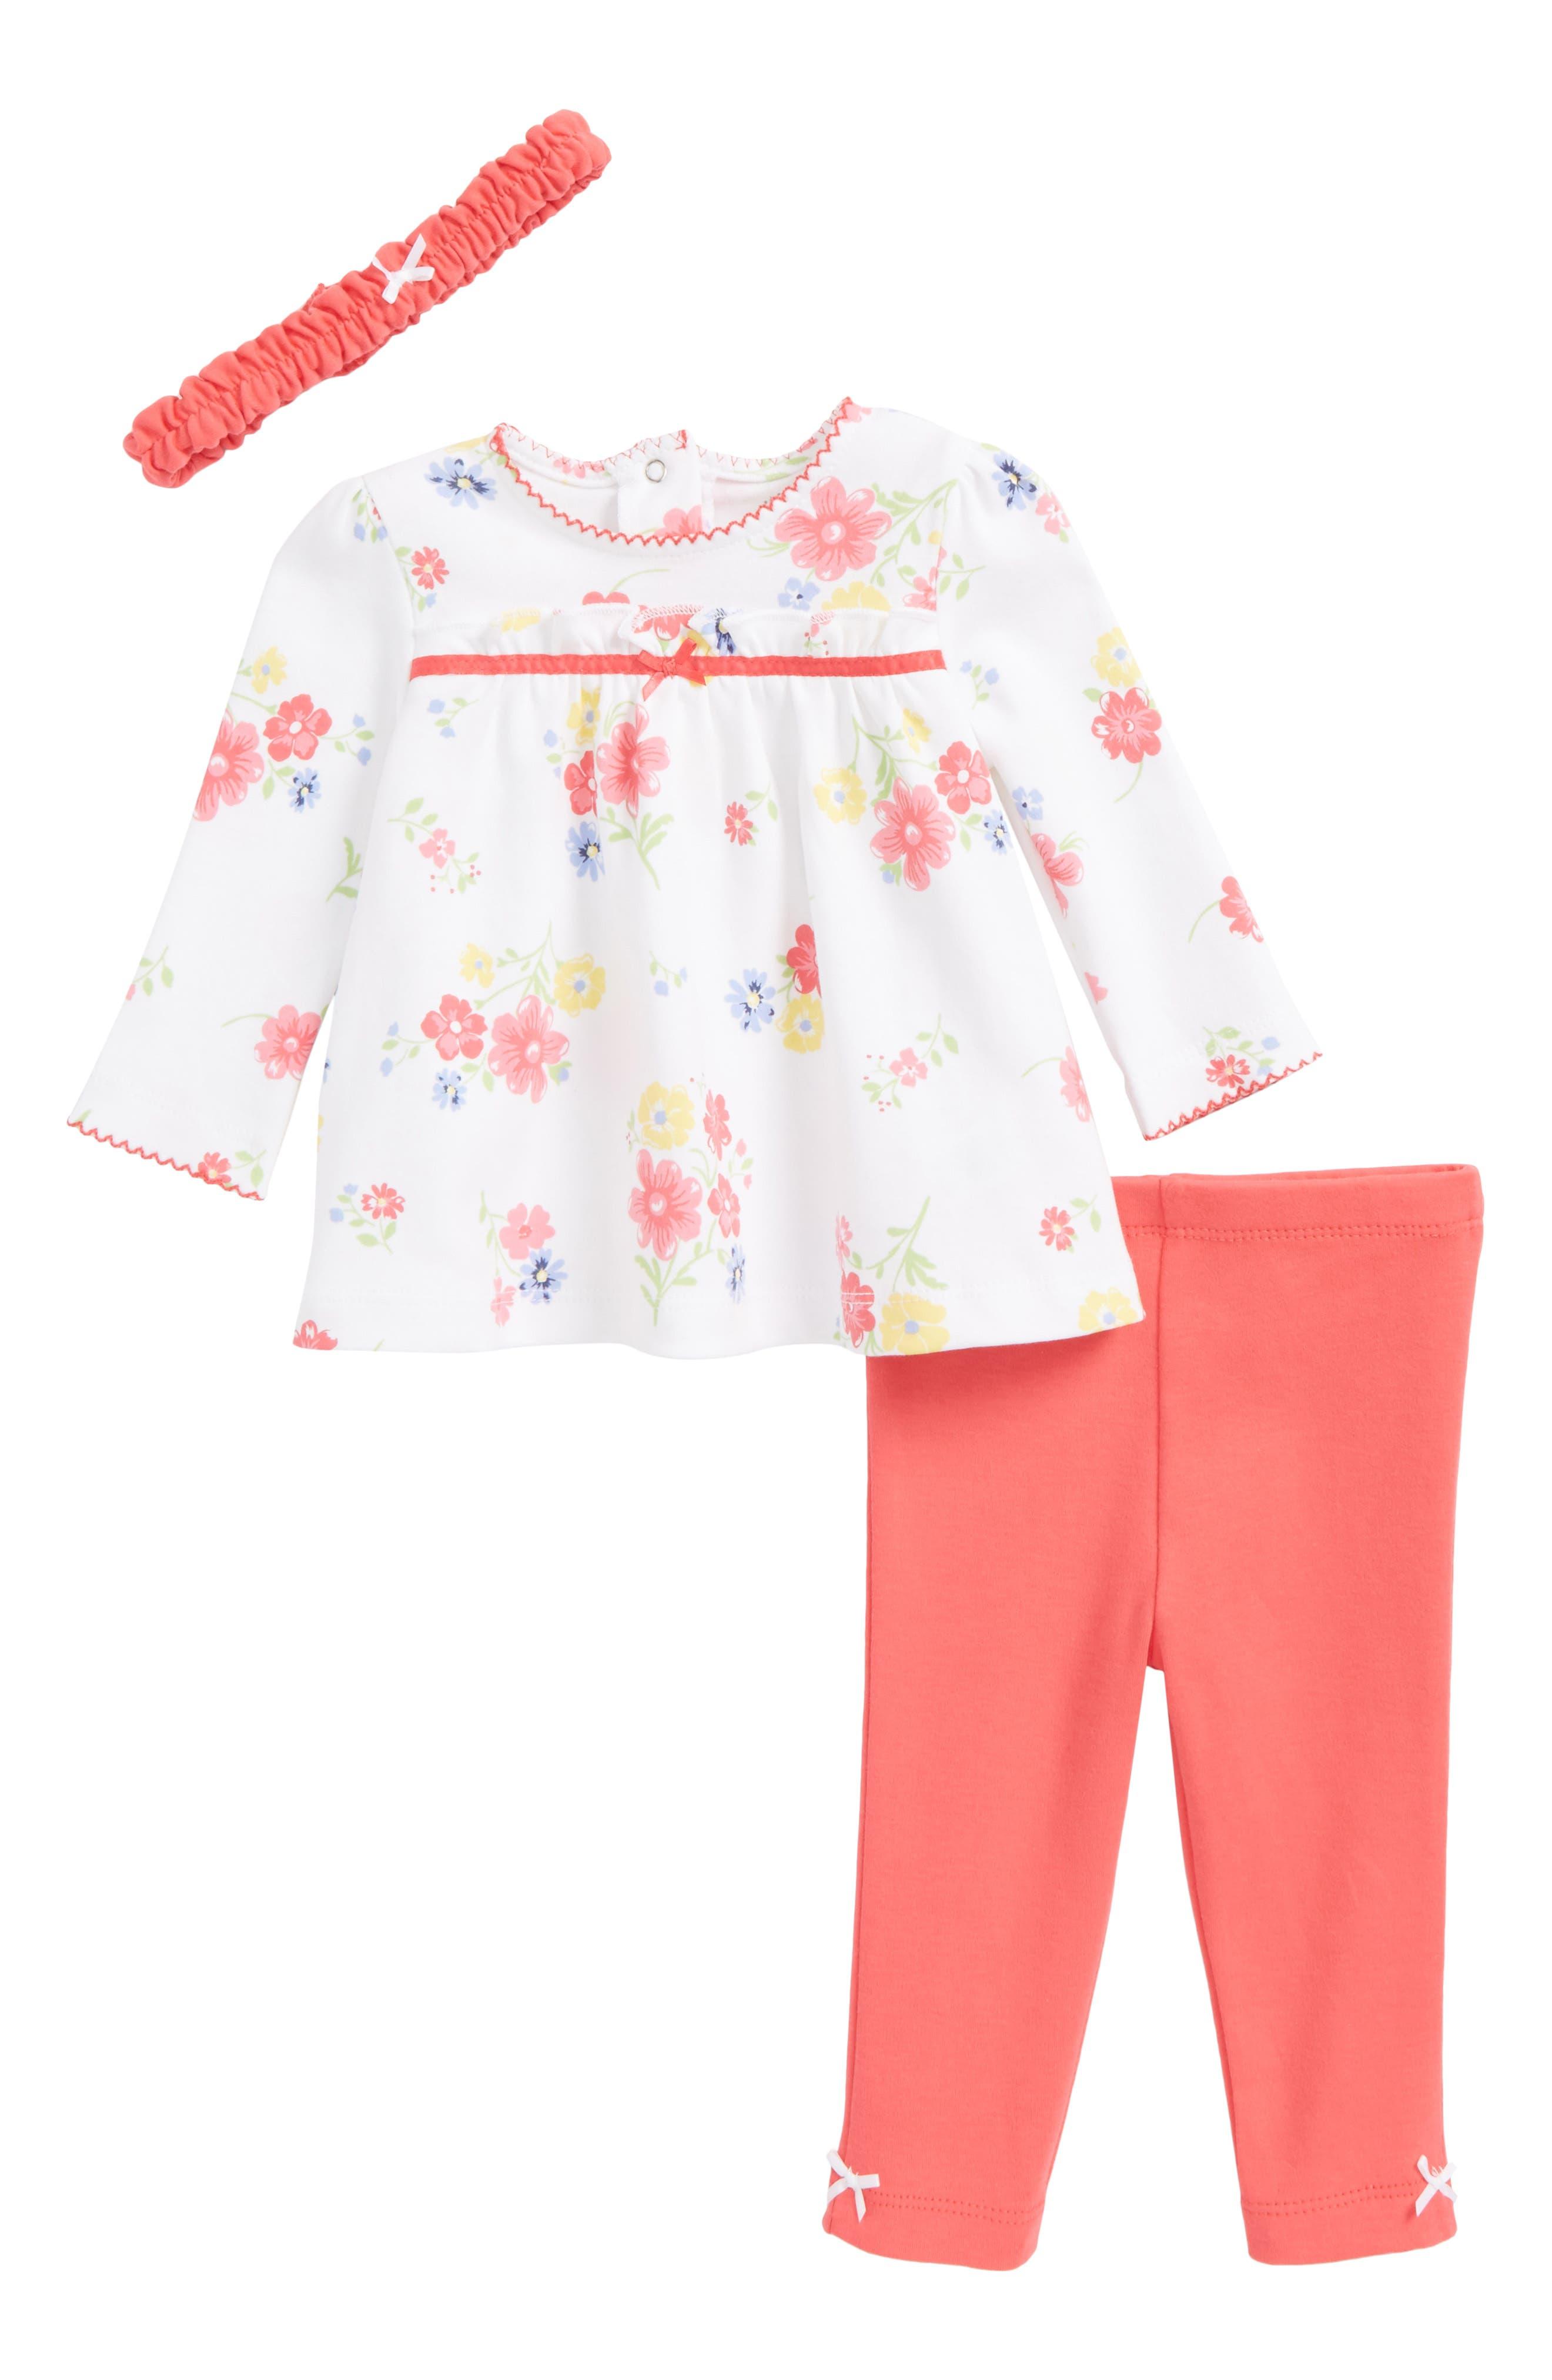 Main Image - Little Me Fun Flower Tunic, Leggings & Headband Set (Baby Girls)